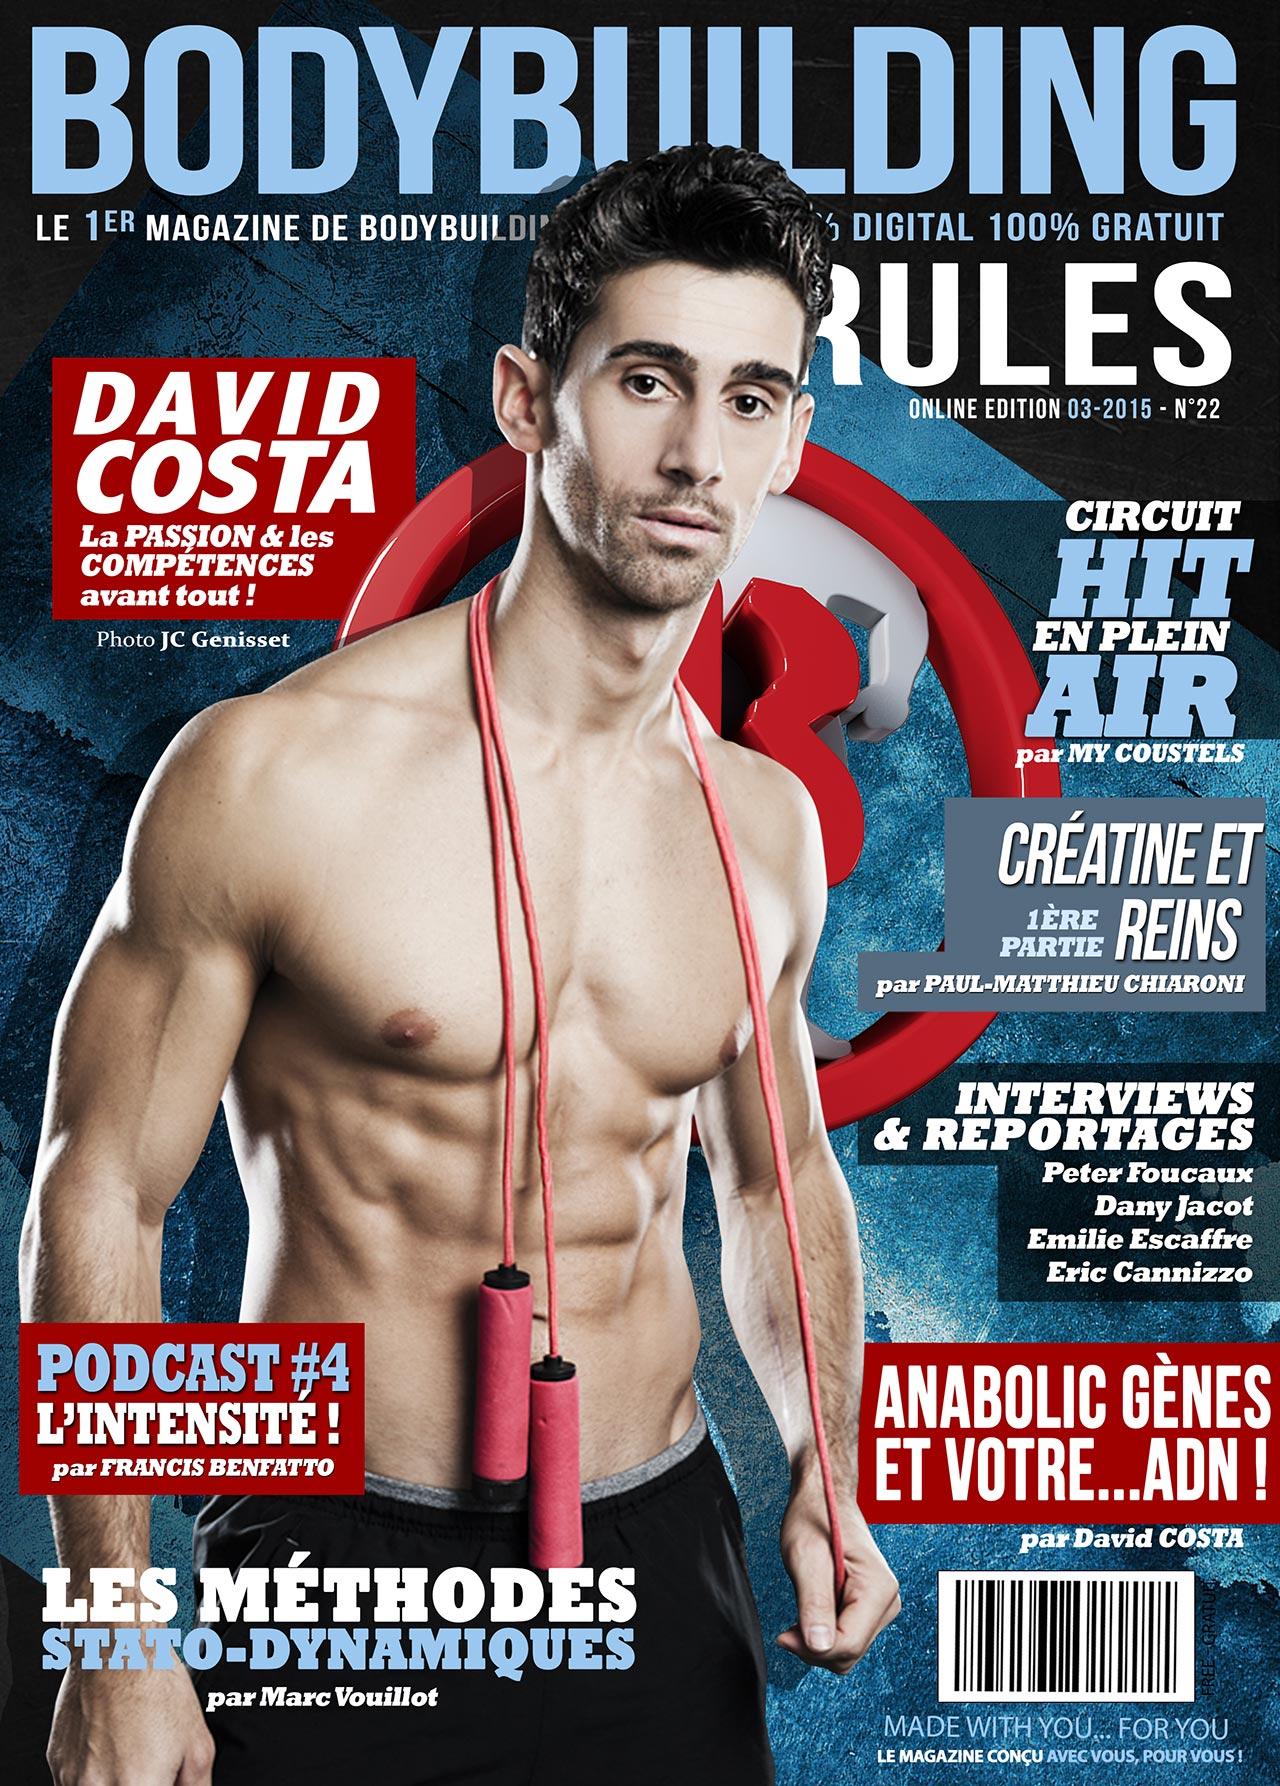 magazine - www.bodybuilding-rules.com le magazine interactif GRATUIT  1bbrM22